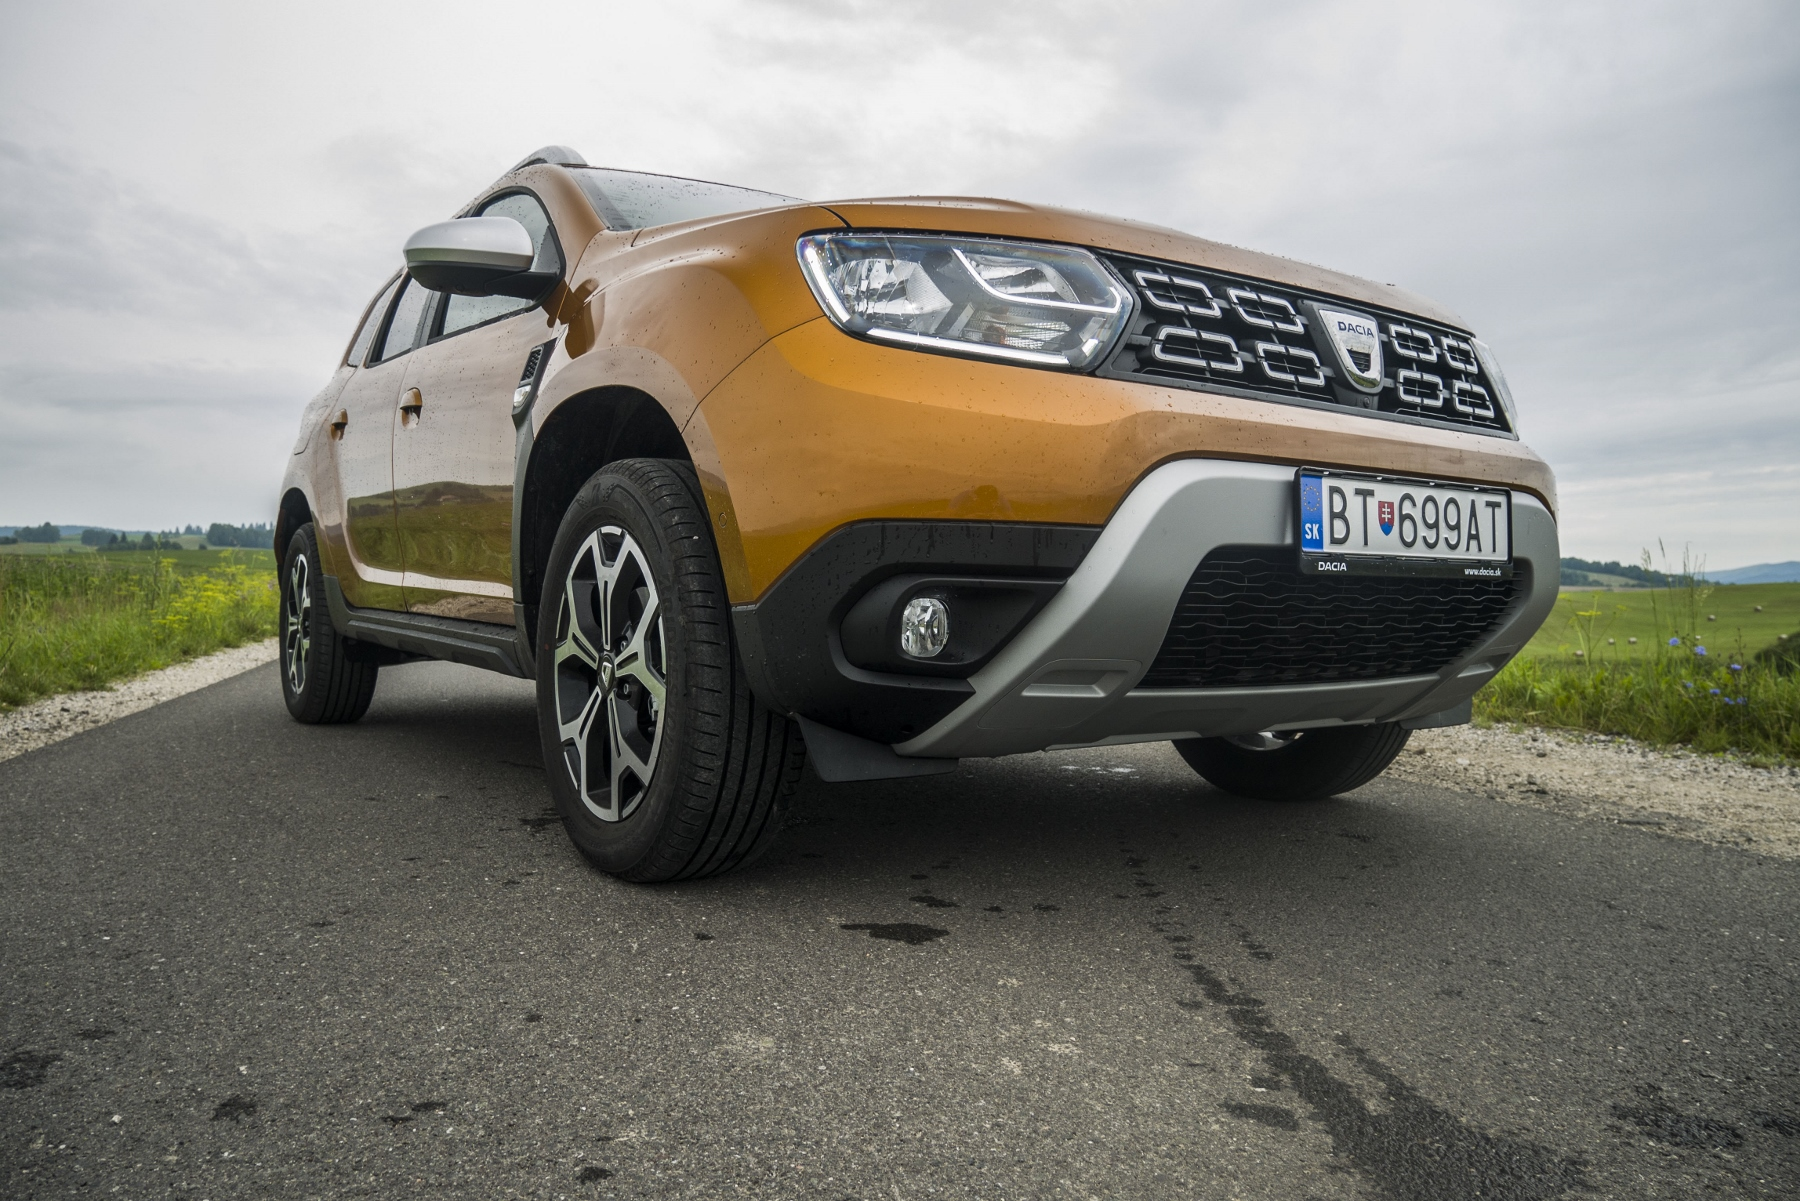 Test: Dacia Duster LPG je voľbou rozumu aAOipi71O6 dacia-duster-lpg-5